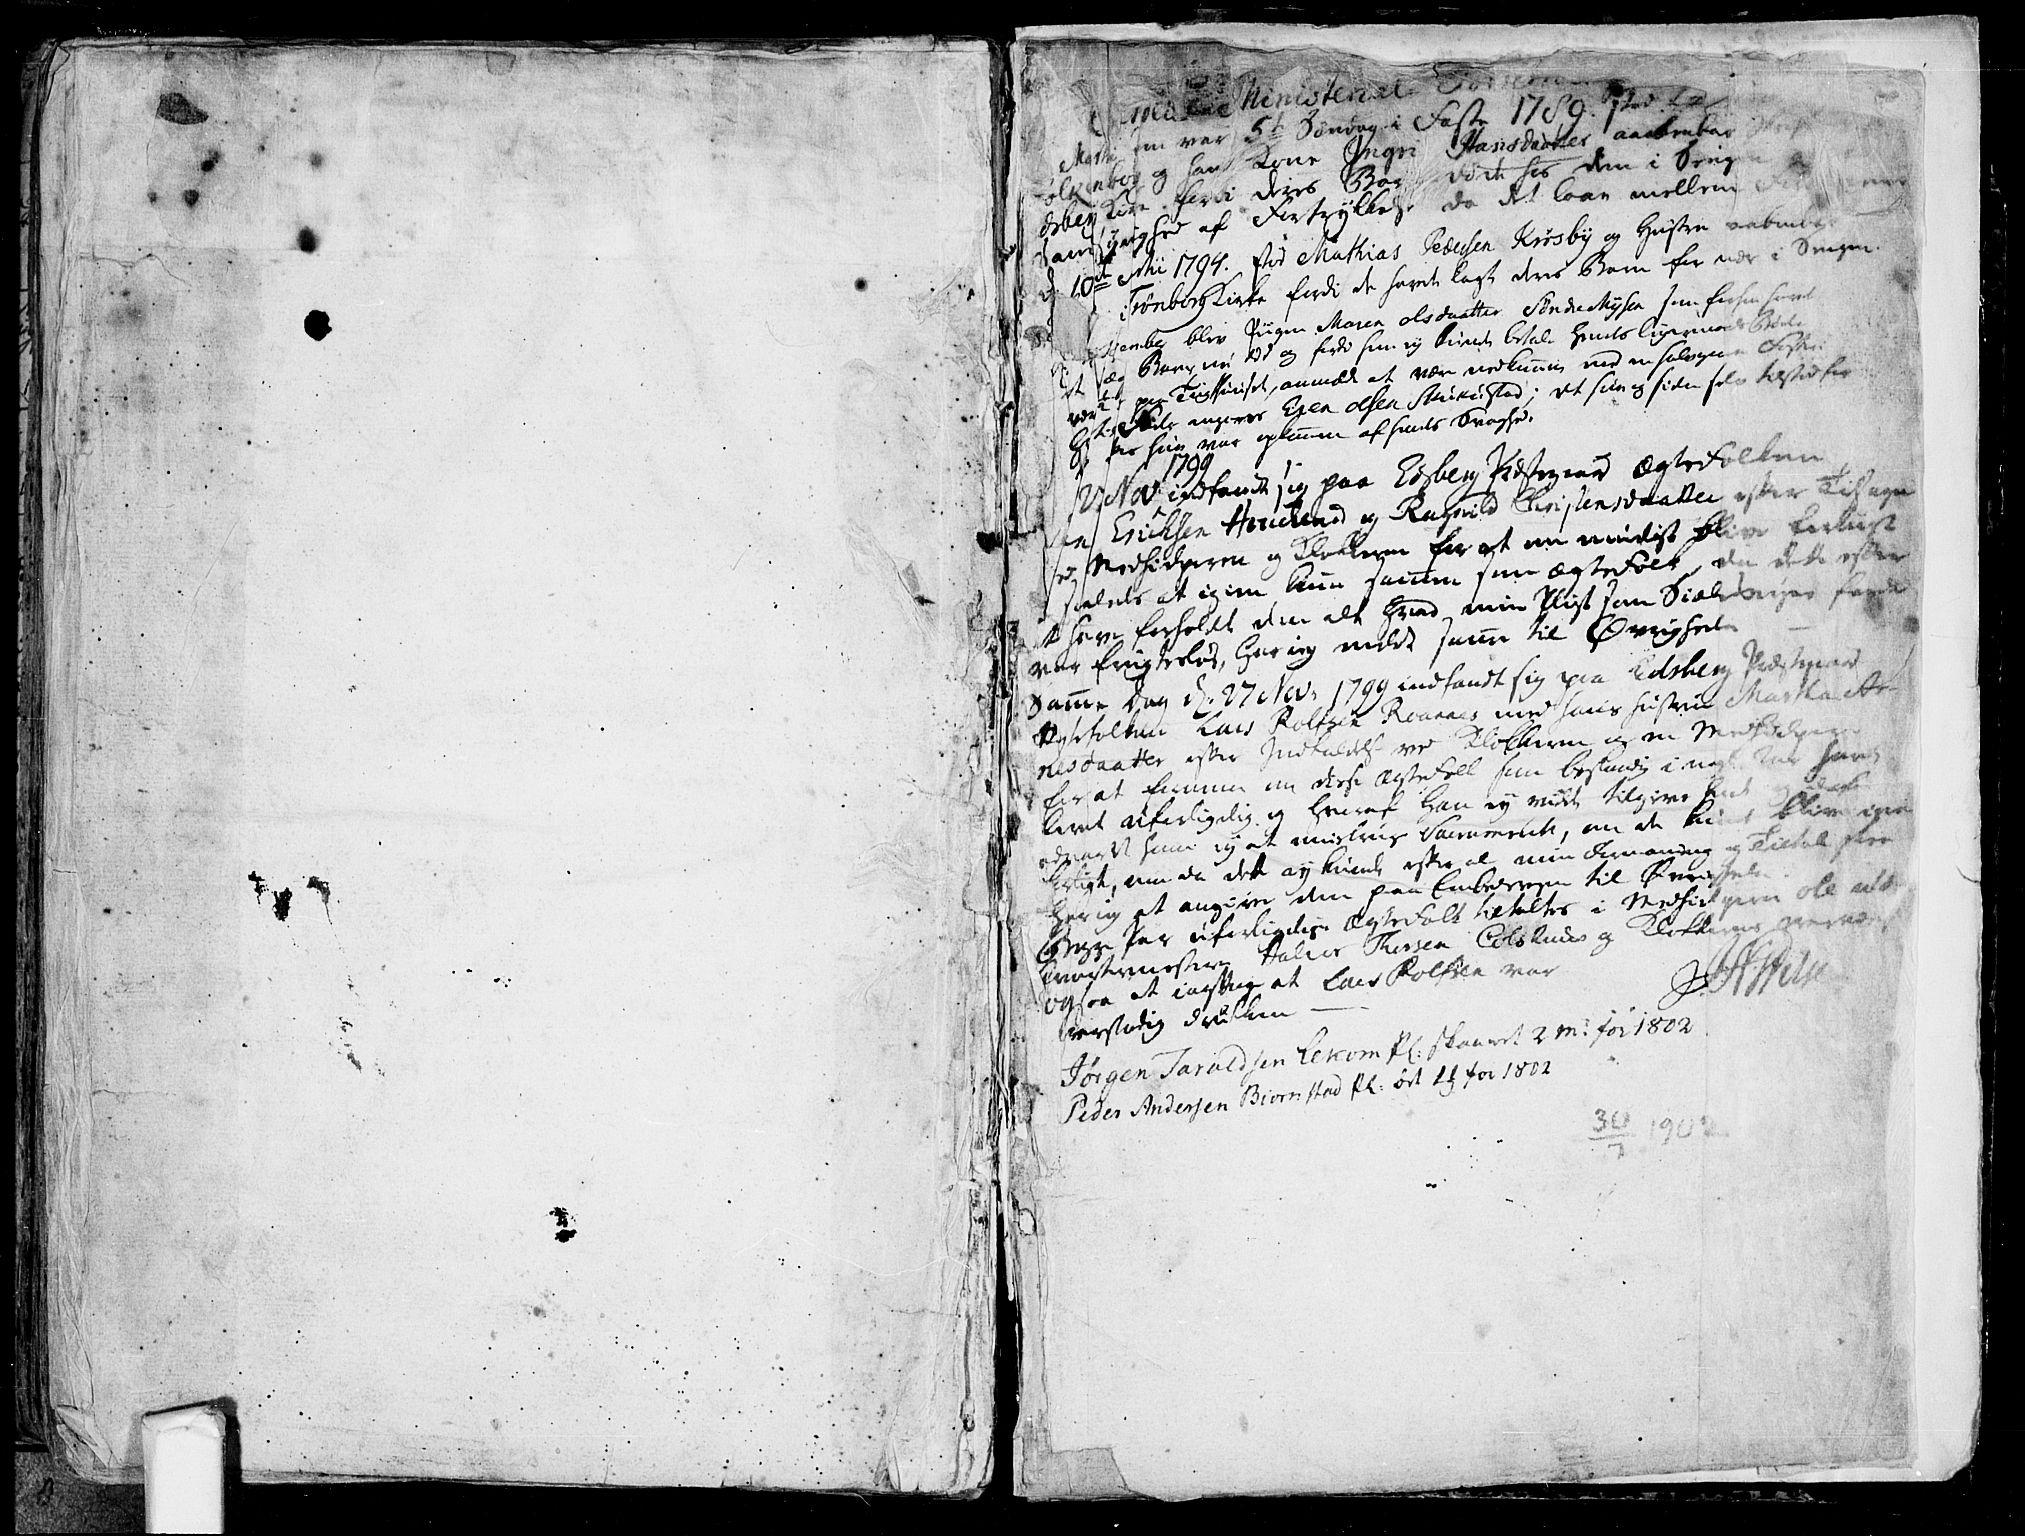 SAO, Eidsberg prestekontor Kirkebøker, F/Fa/L0005: Ministerialbok nr. I 5, 1786-1807, s. 184